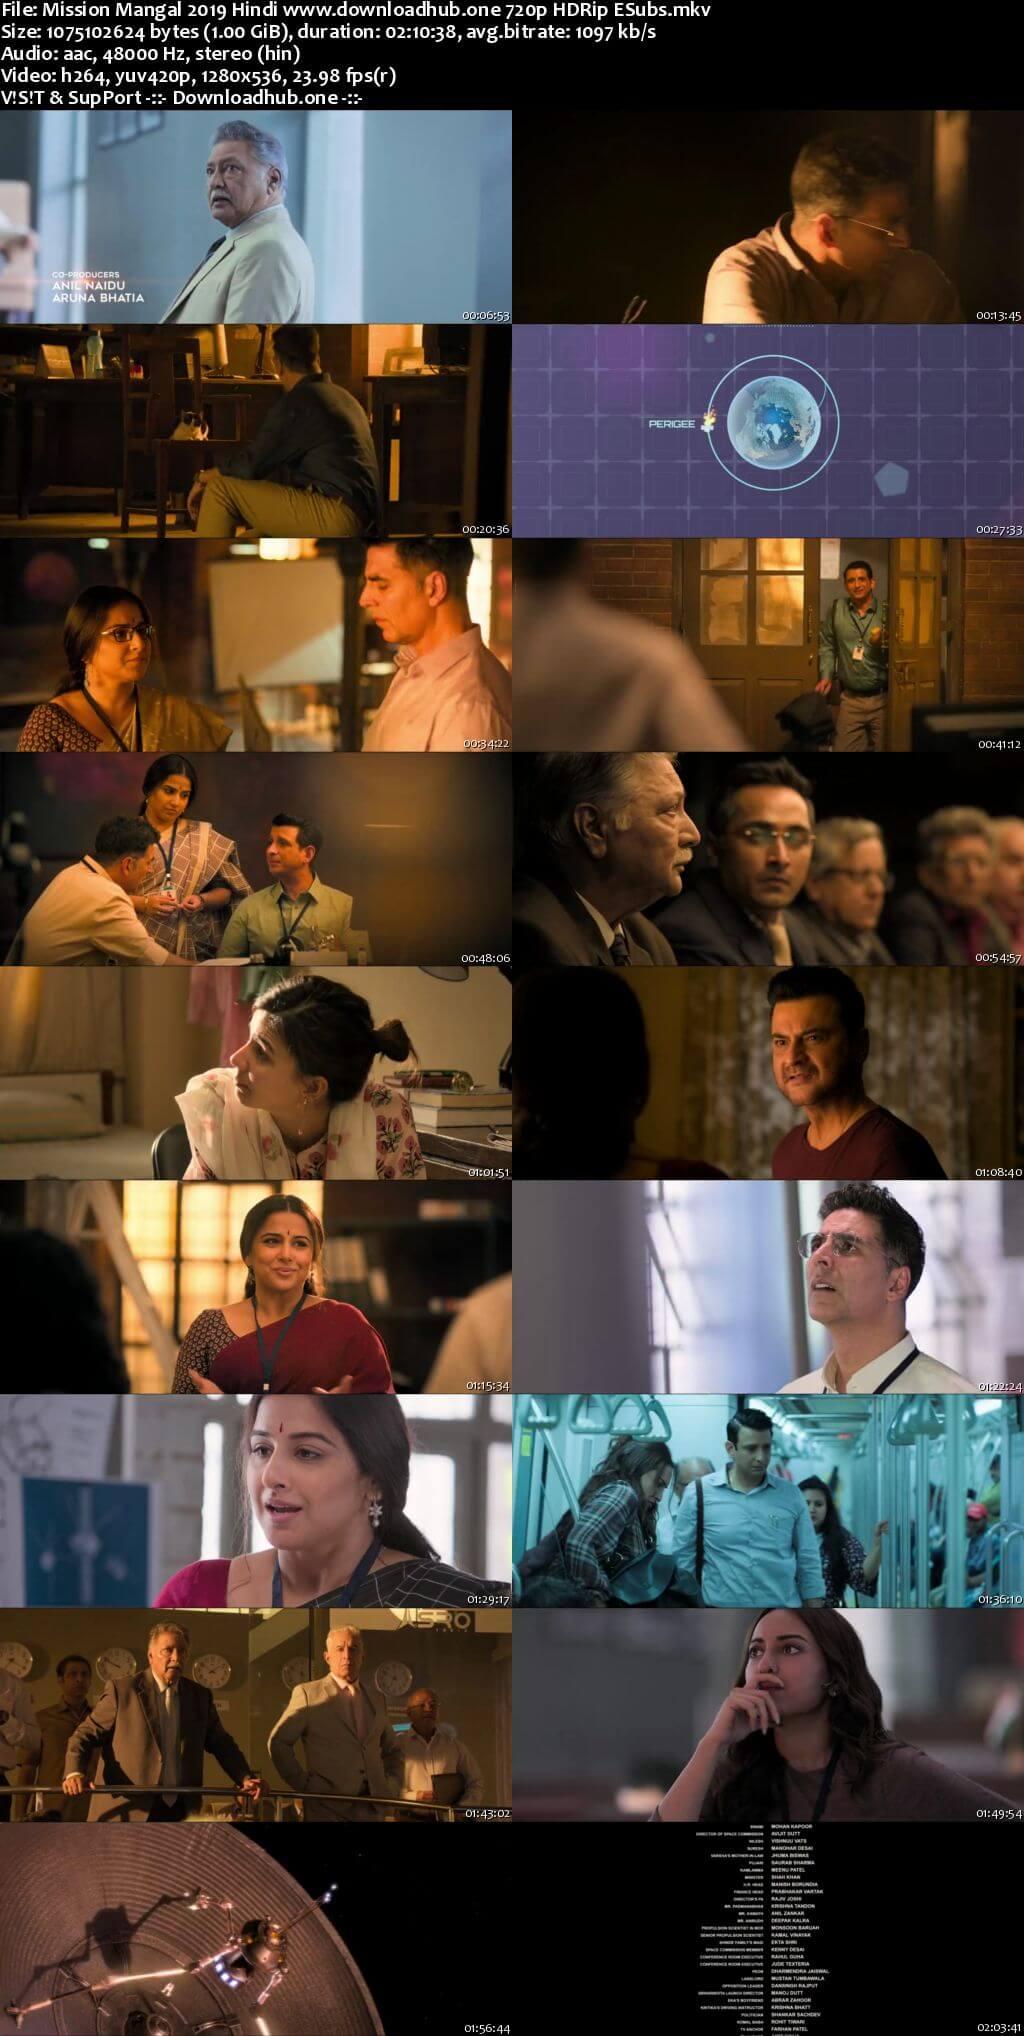 Mission Mangal 2019 Hindi 720p HDRip ESubs